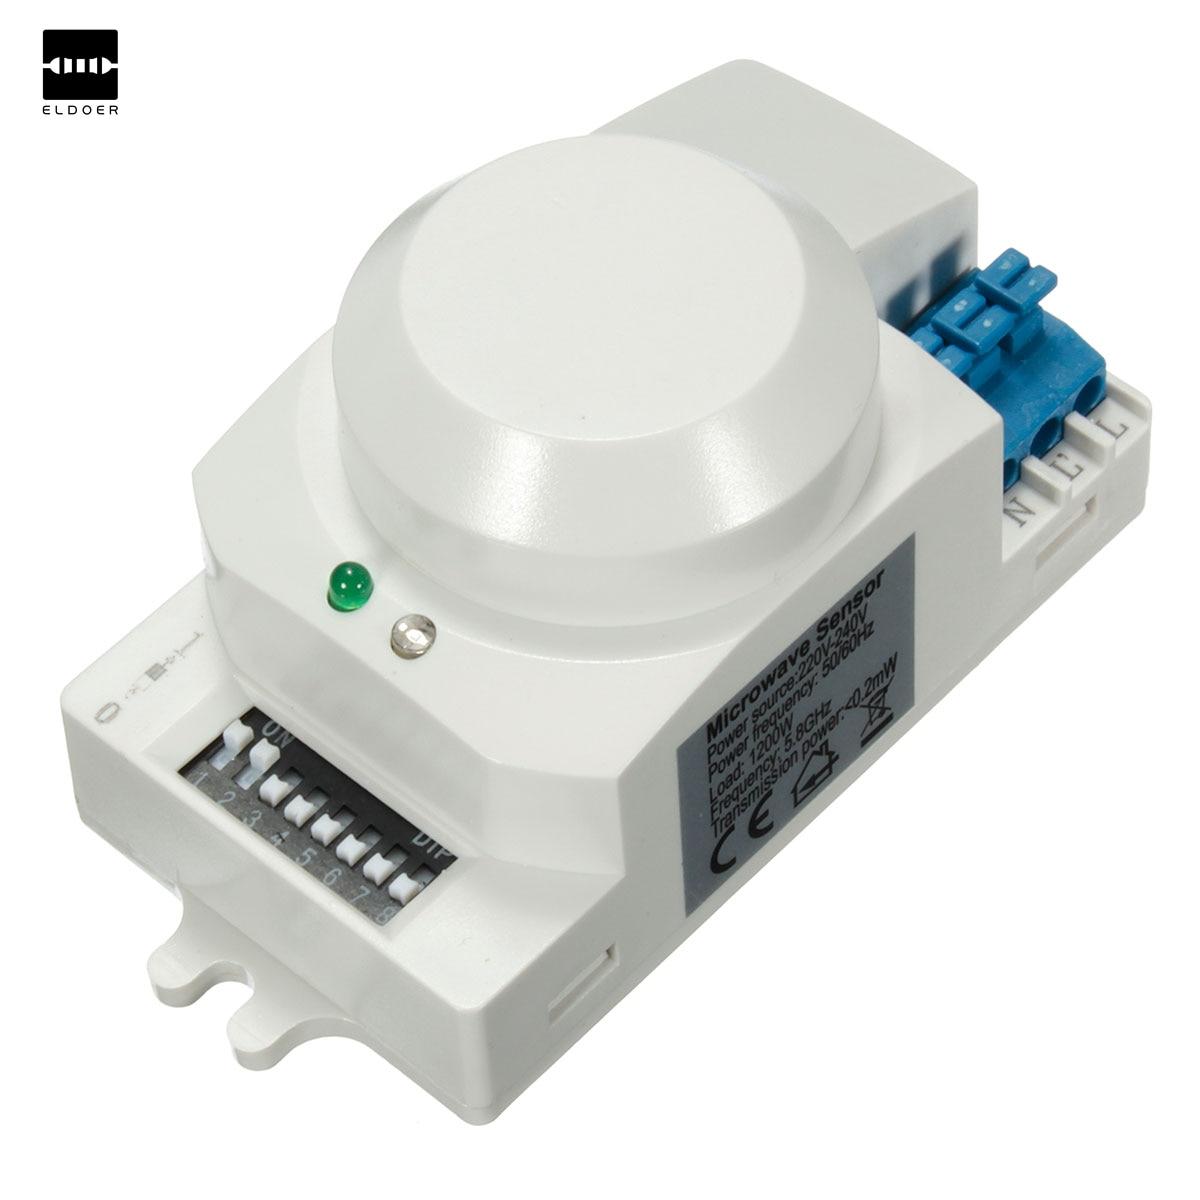 New Electric High Frequency AC 220V-240V 5.8GHz Microwave Radar Sensor Body Motion HF Detector Light Switch Sensors 85x38x40mmNew Electric High Frequency AC 220V-240V 5.8GHz Microwave Radar Sensor Body Motion HF Detector Light Switch Sensors 85x38x40mm